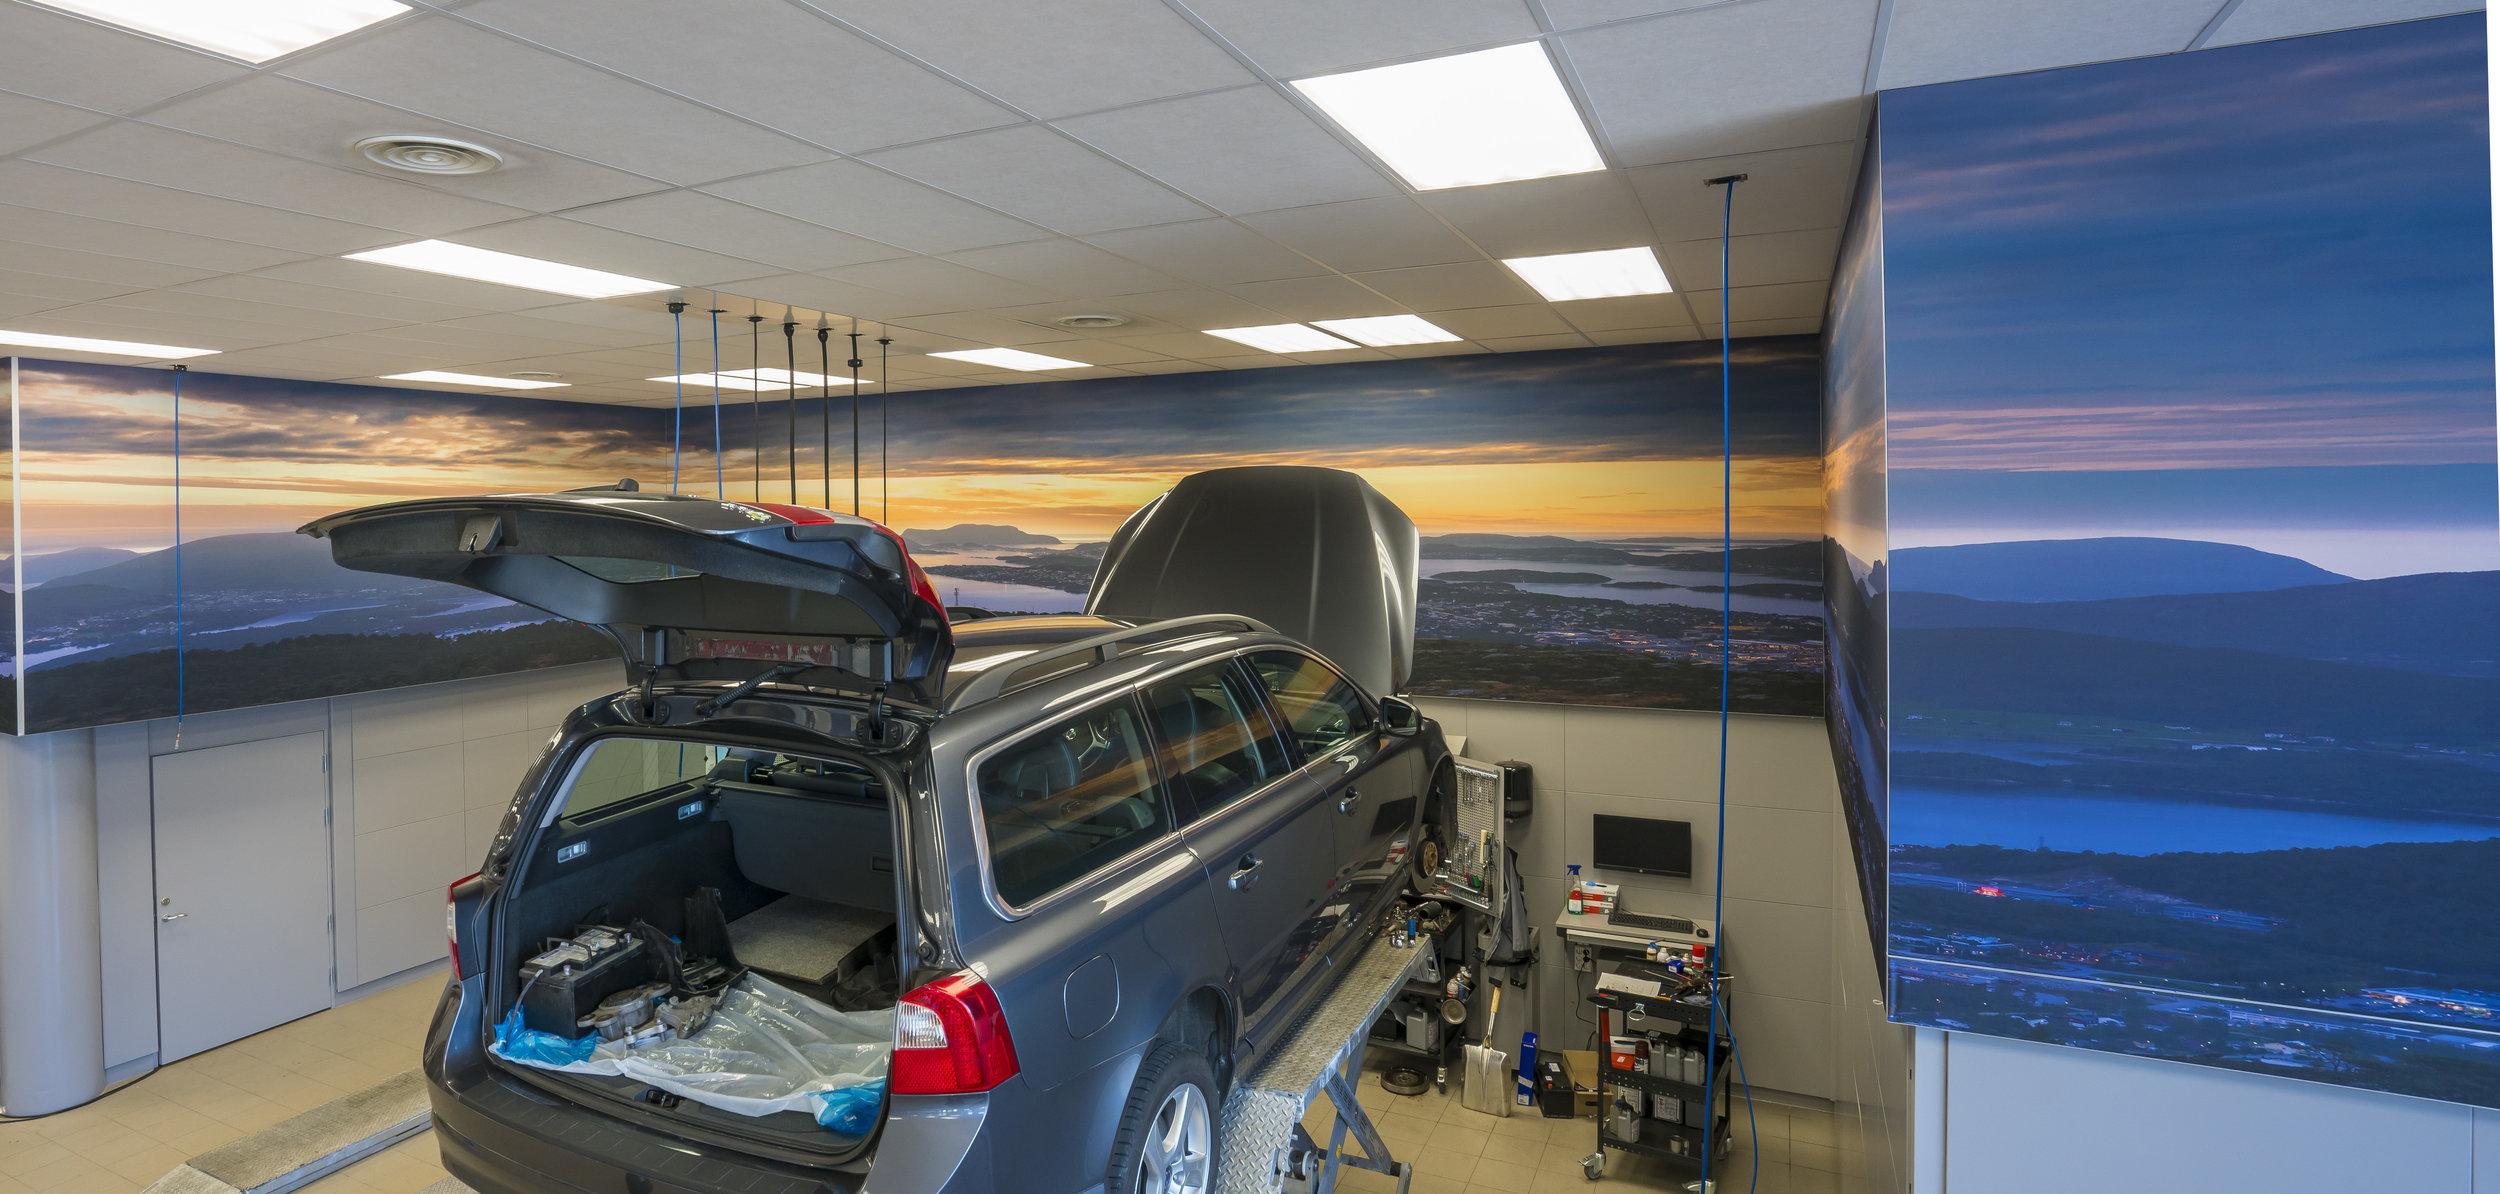 Ålesund Bil, 2 bilder totalt 57 meter lengde. Fra Gigapixel arkiv.